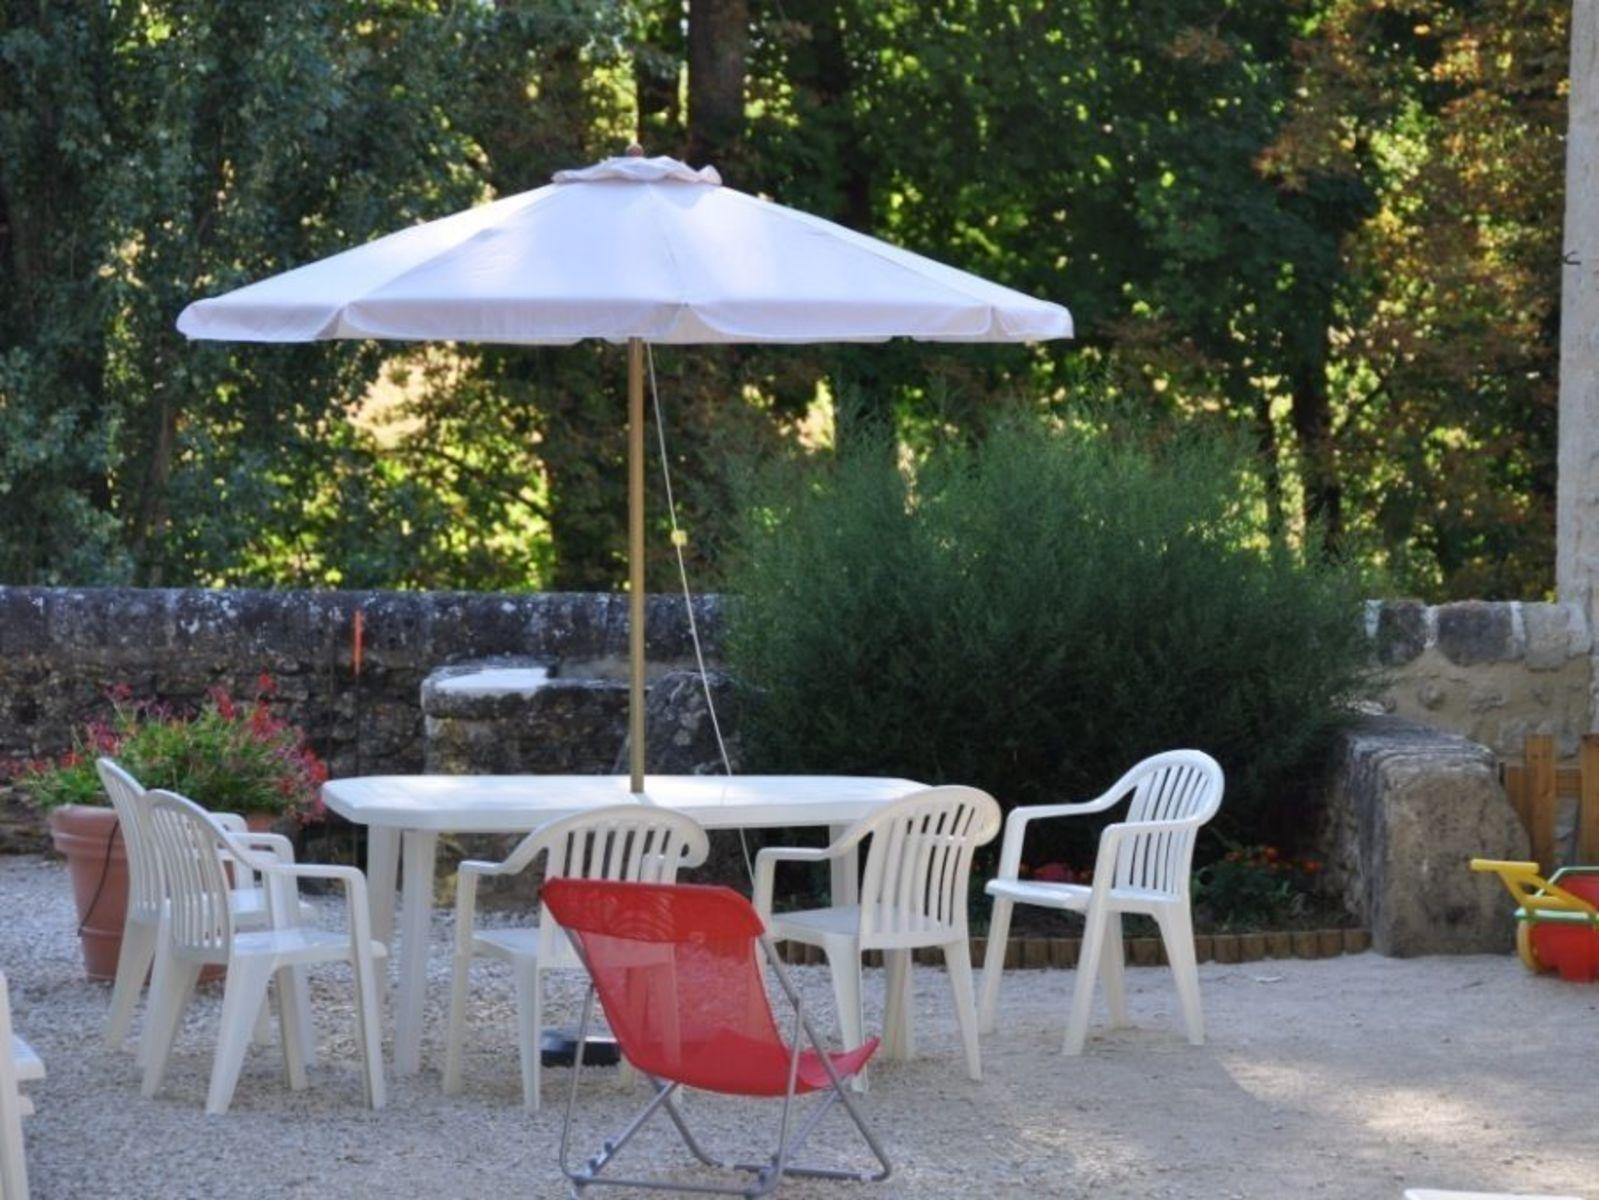 Domaine de Valence - Le Bassin vakantievilla Zuid-Frankrijk